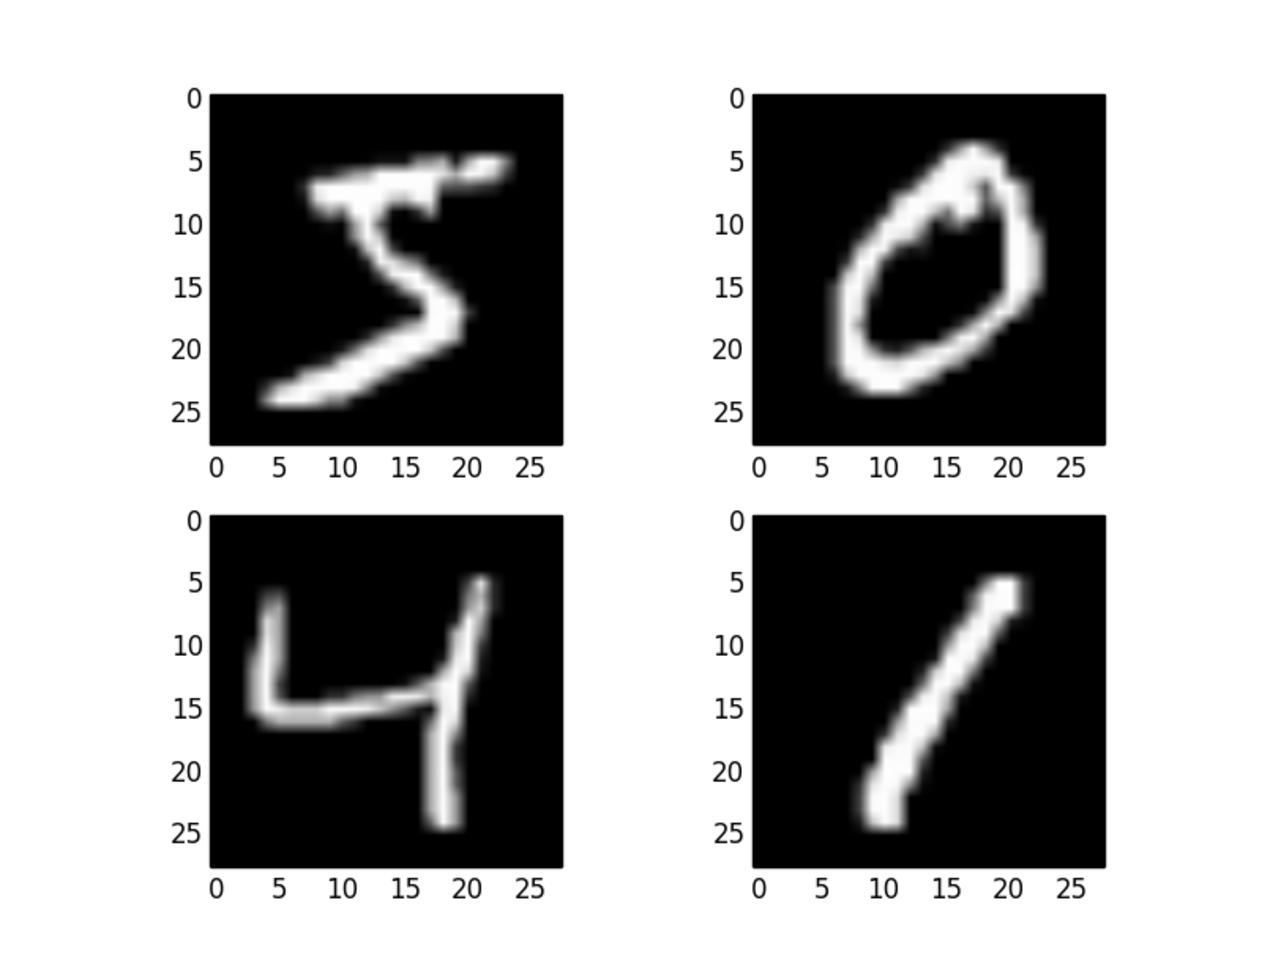 fashion Mnist datasets using CNN(tensorflow)